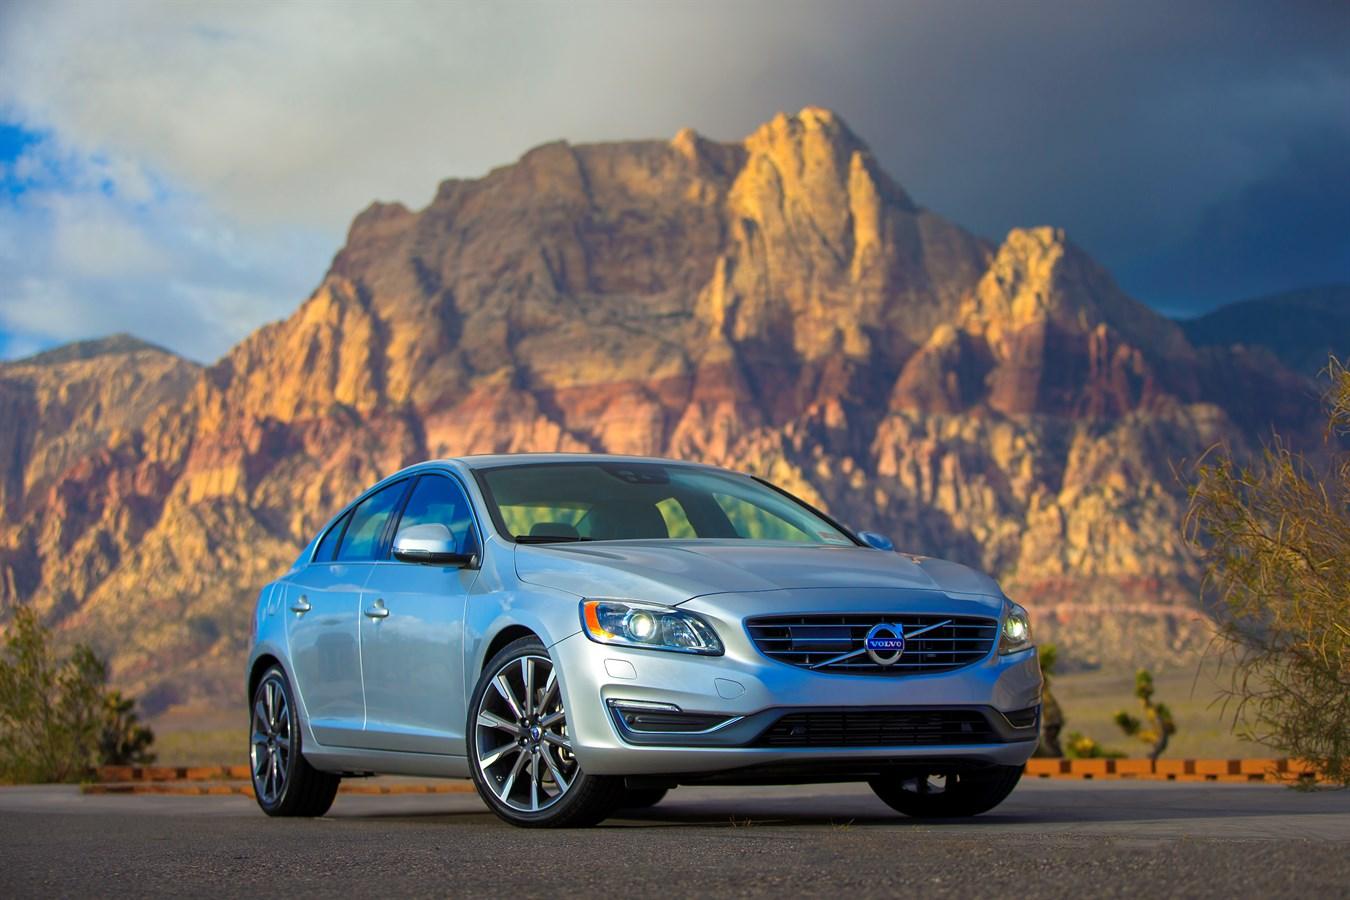 Volvo S60 Model Year 2015 Volvo Car Group Global Media Newsroom